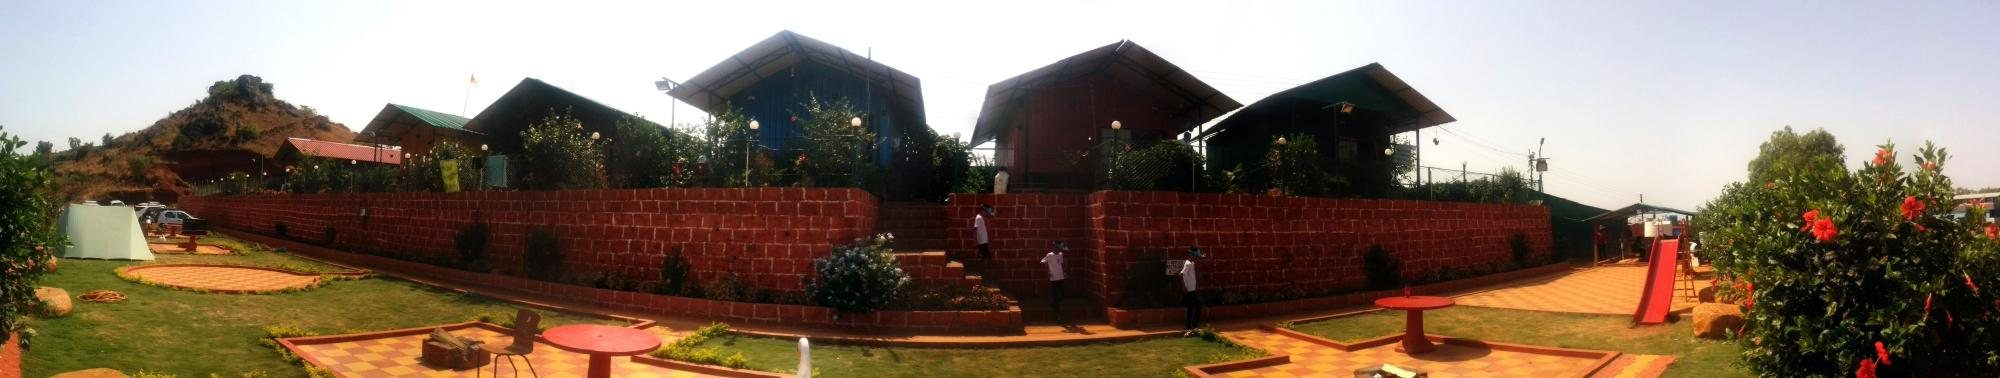 Panchgani Tent House